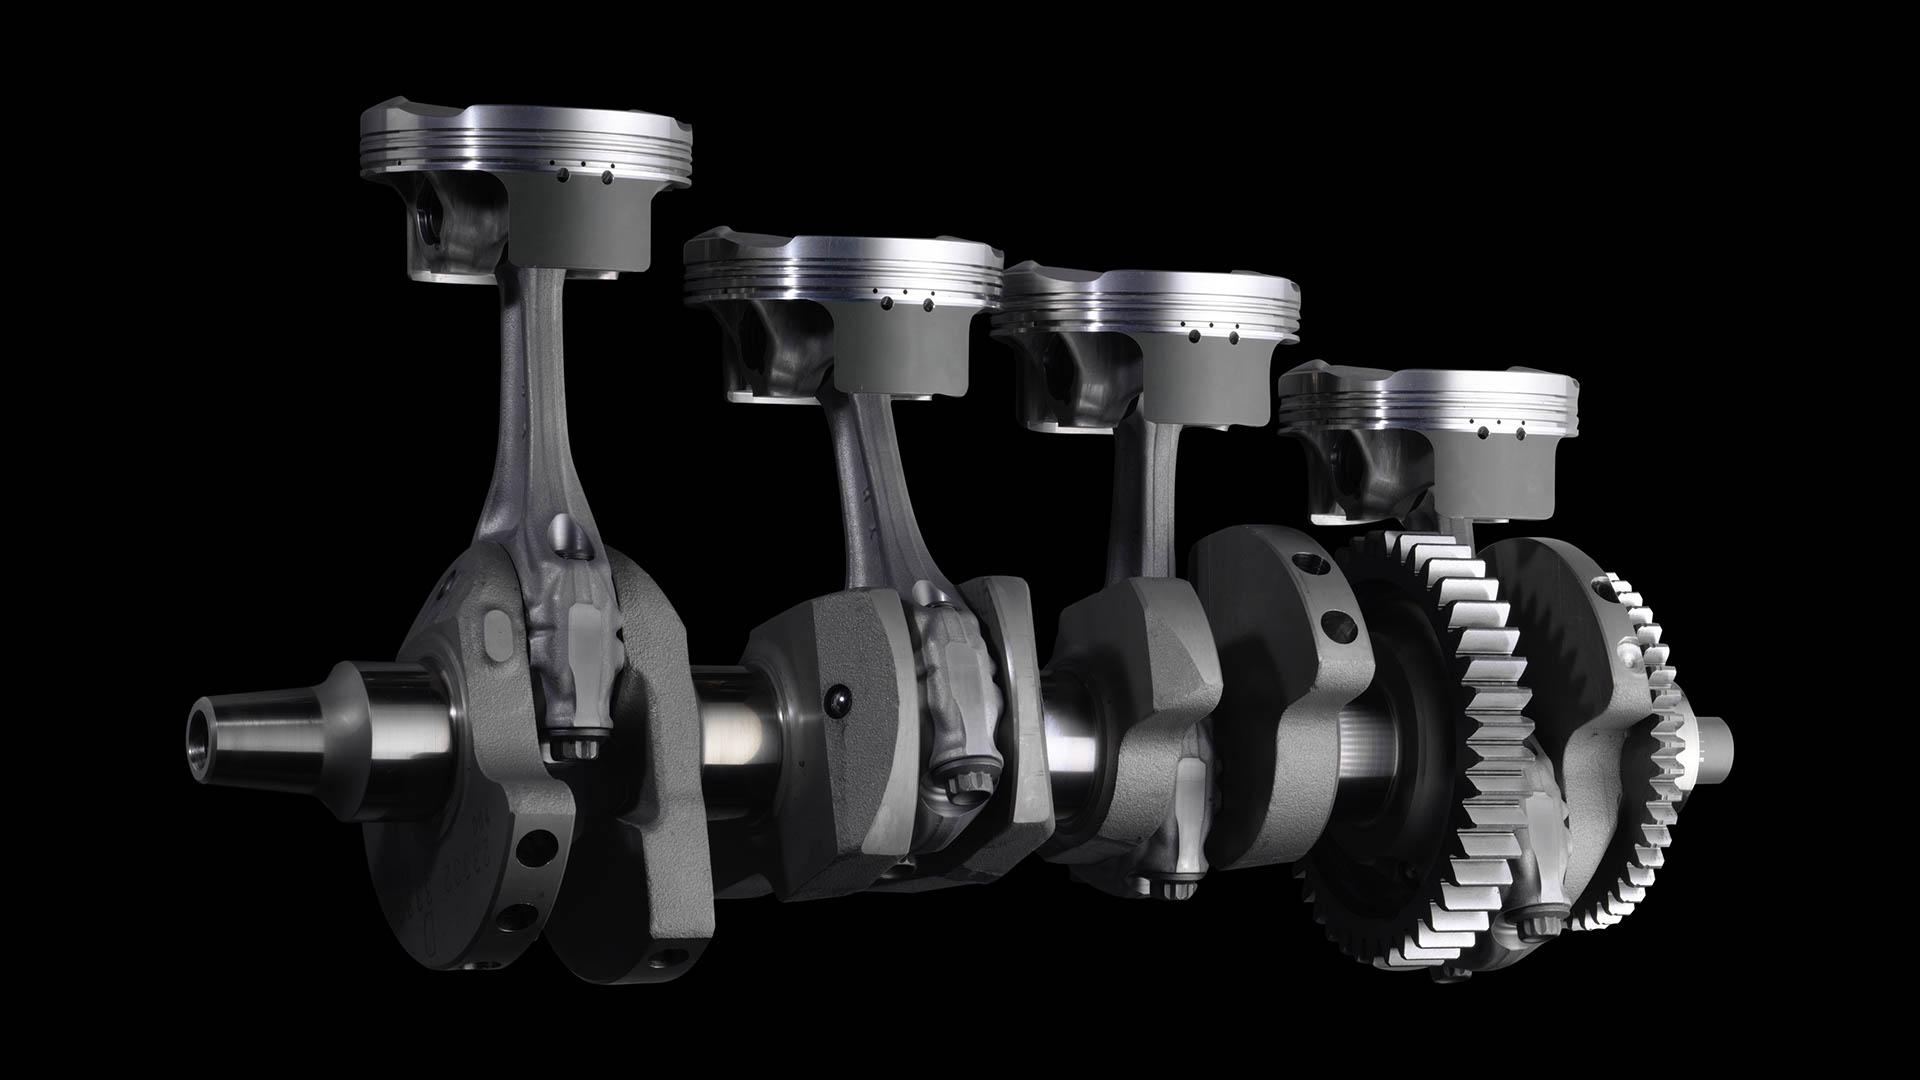 Motor cuatro cilindros Yamaha R1 2015